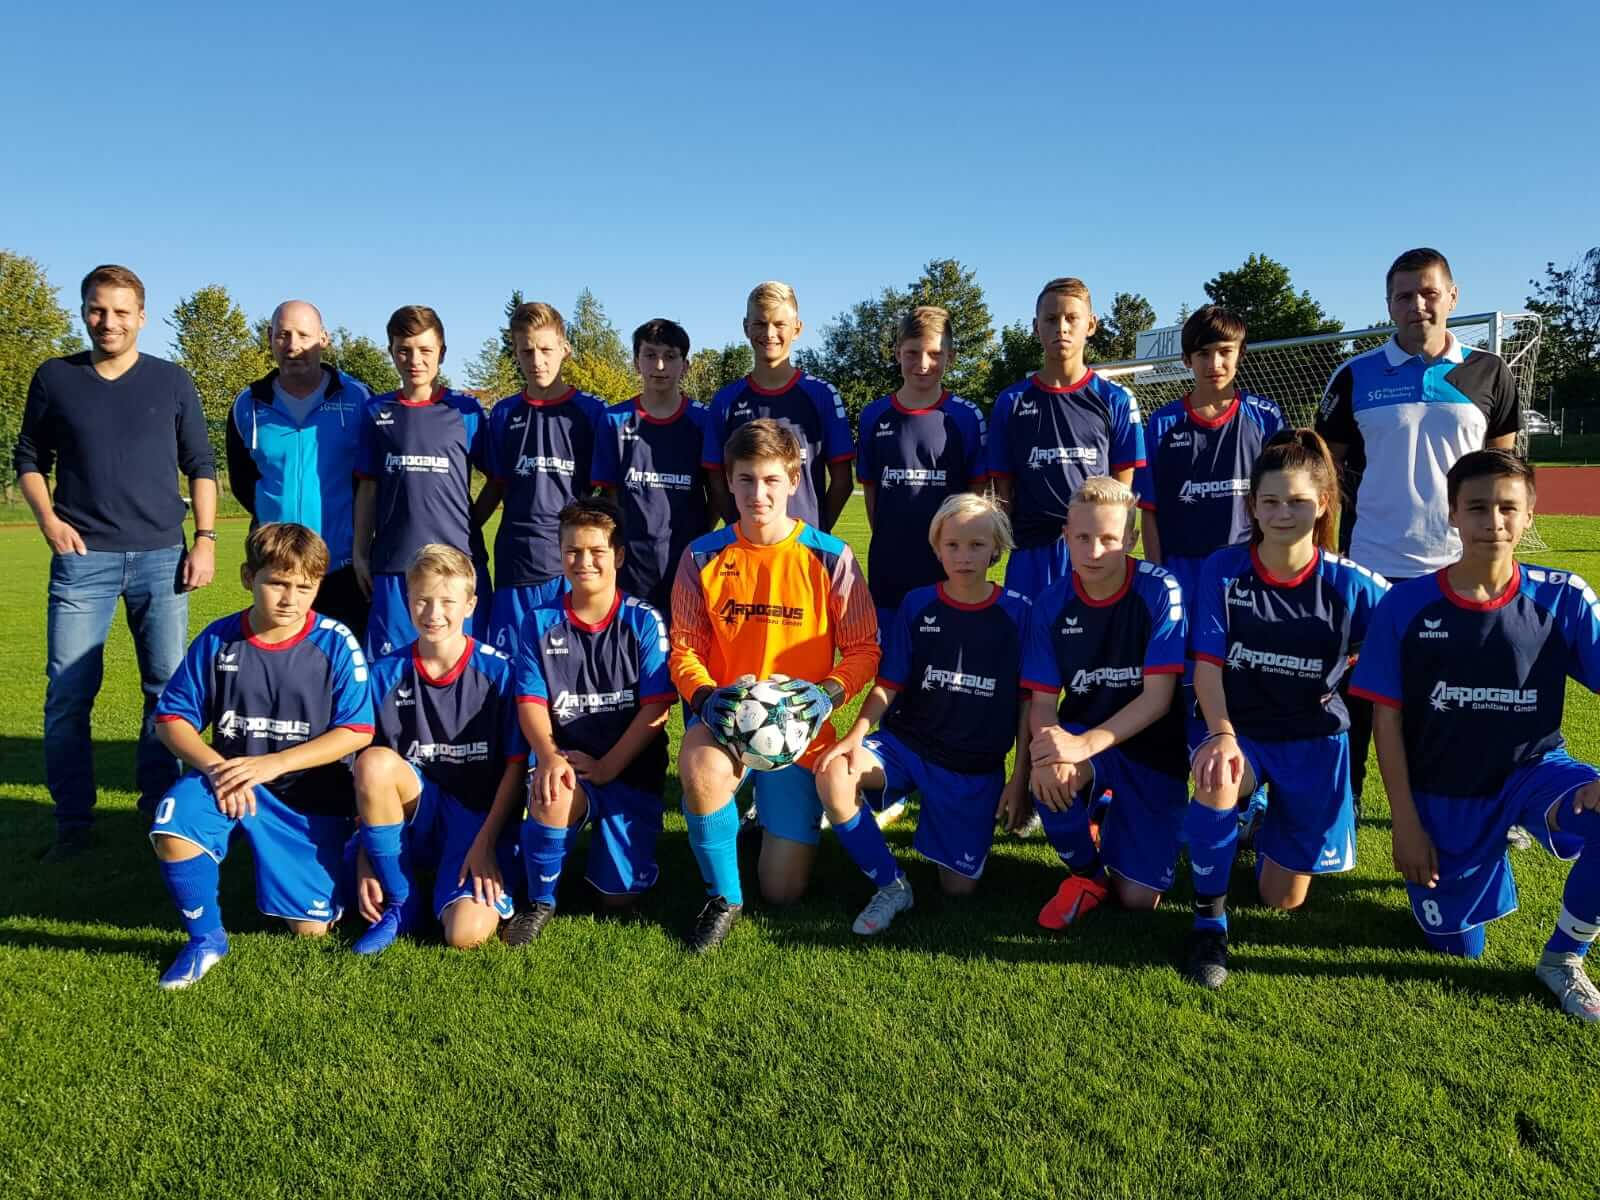 Arpogaus unterstützt den Jugendsport Fussball